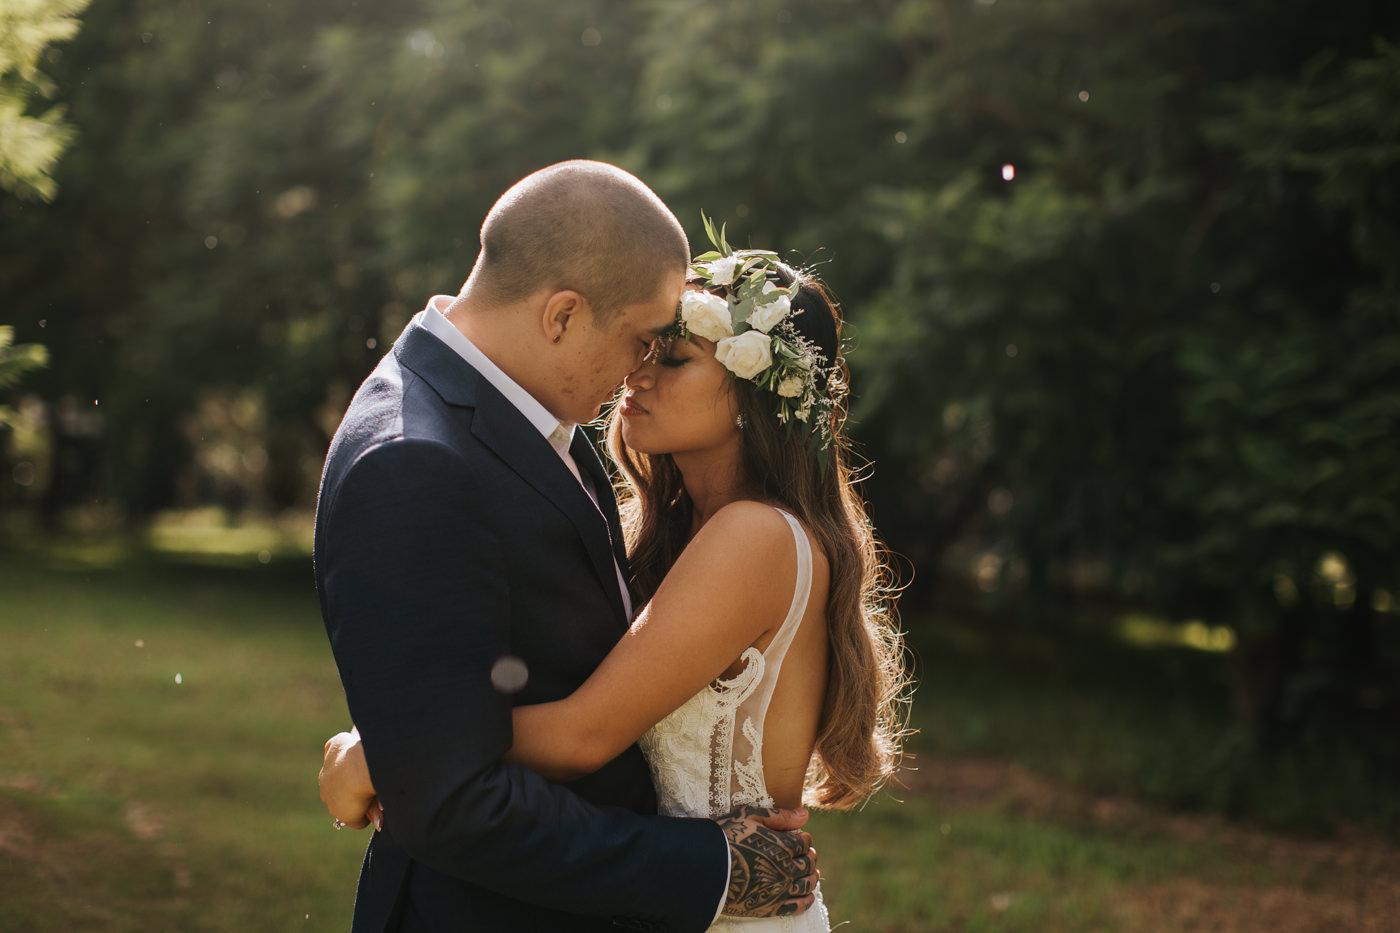 Nick & Vanezza - Fernbank Farm Wedding - Samantha Heather Photography-121.jpg